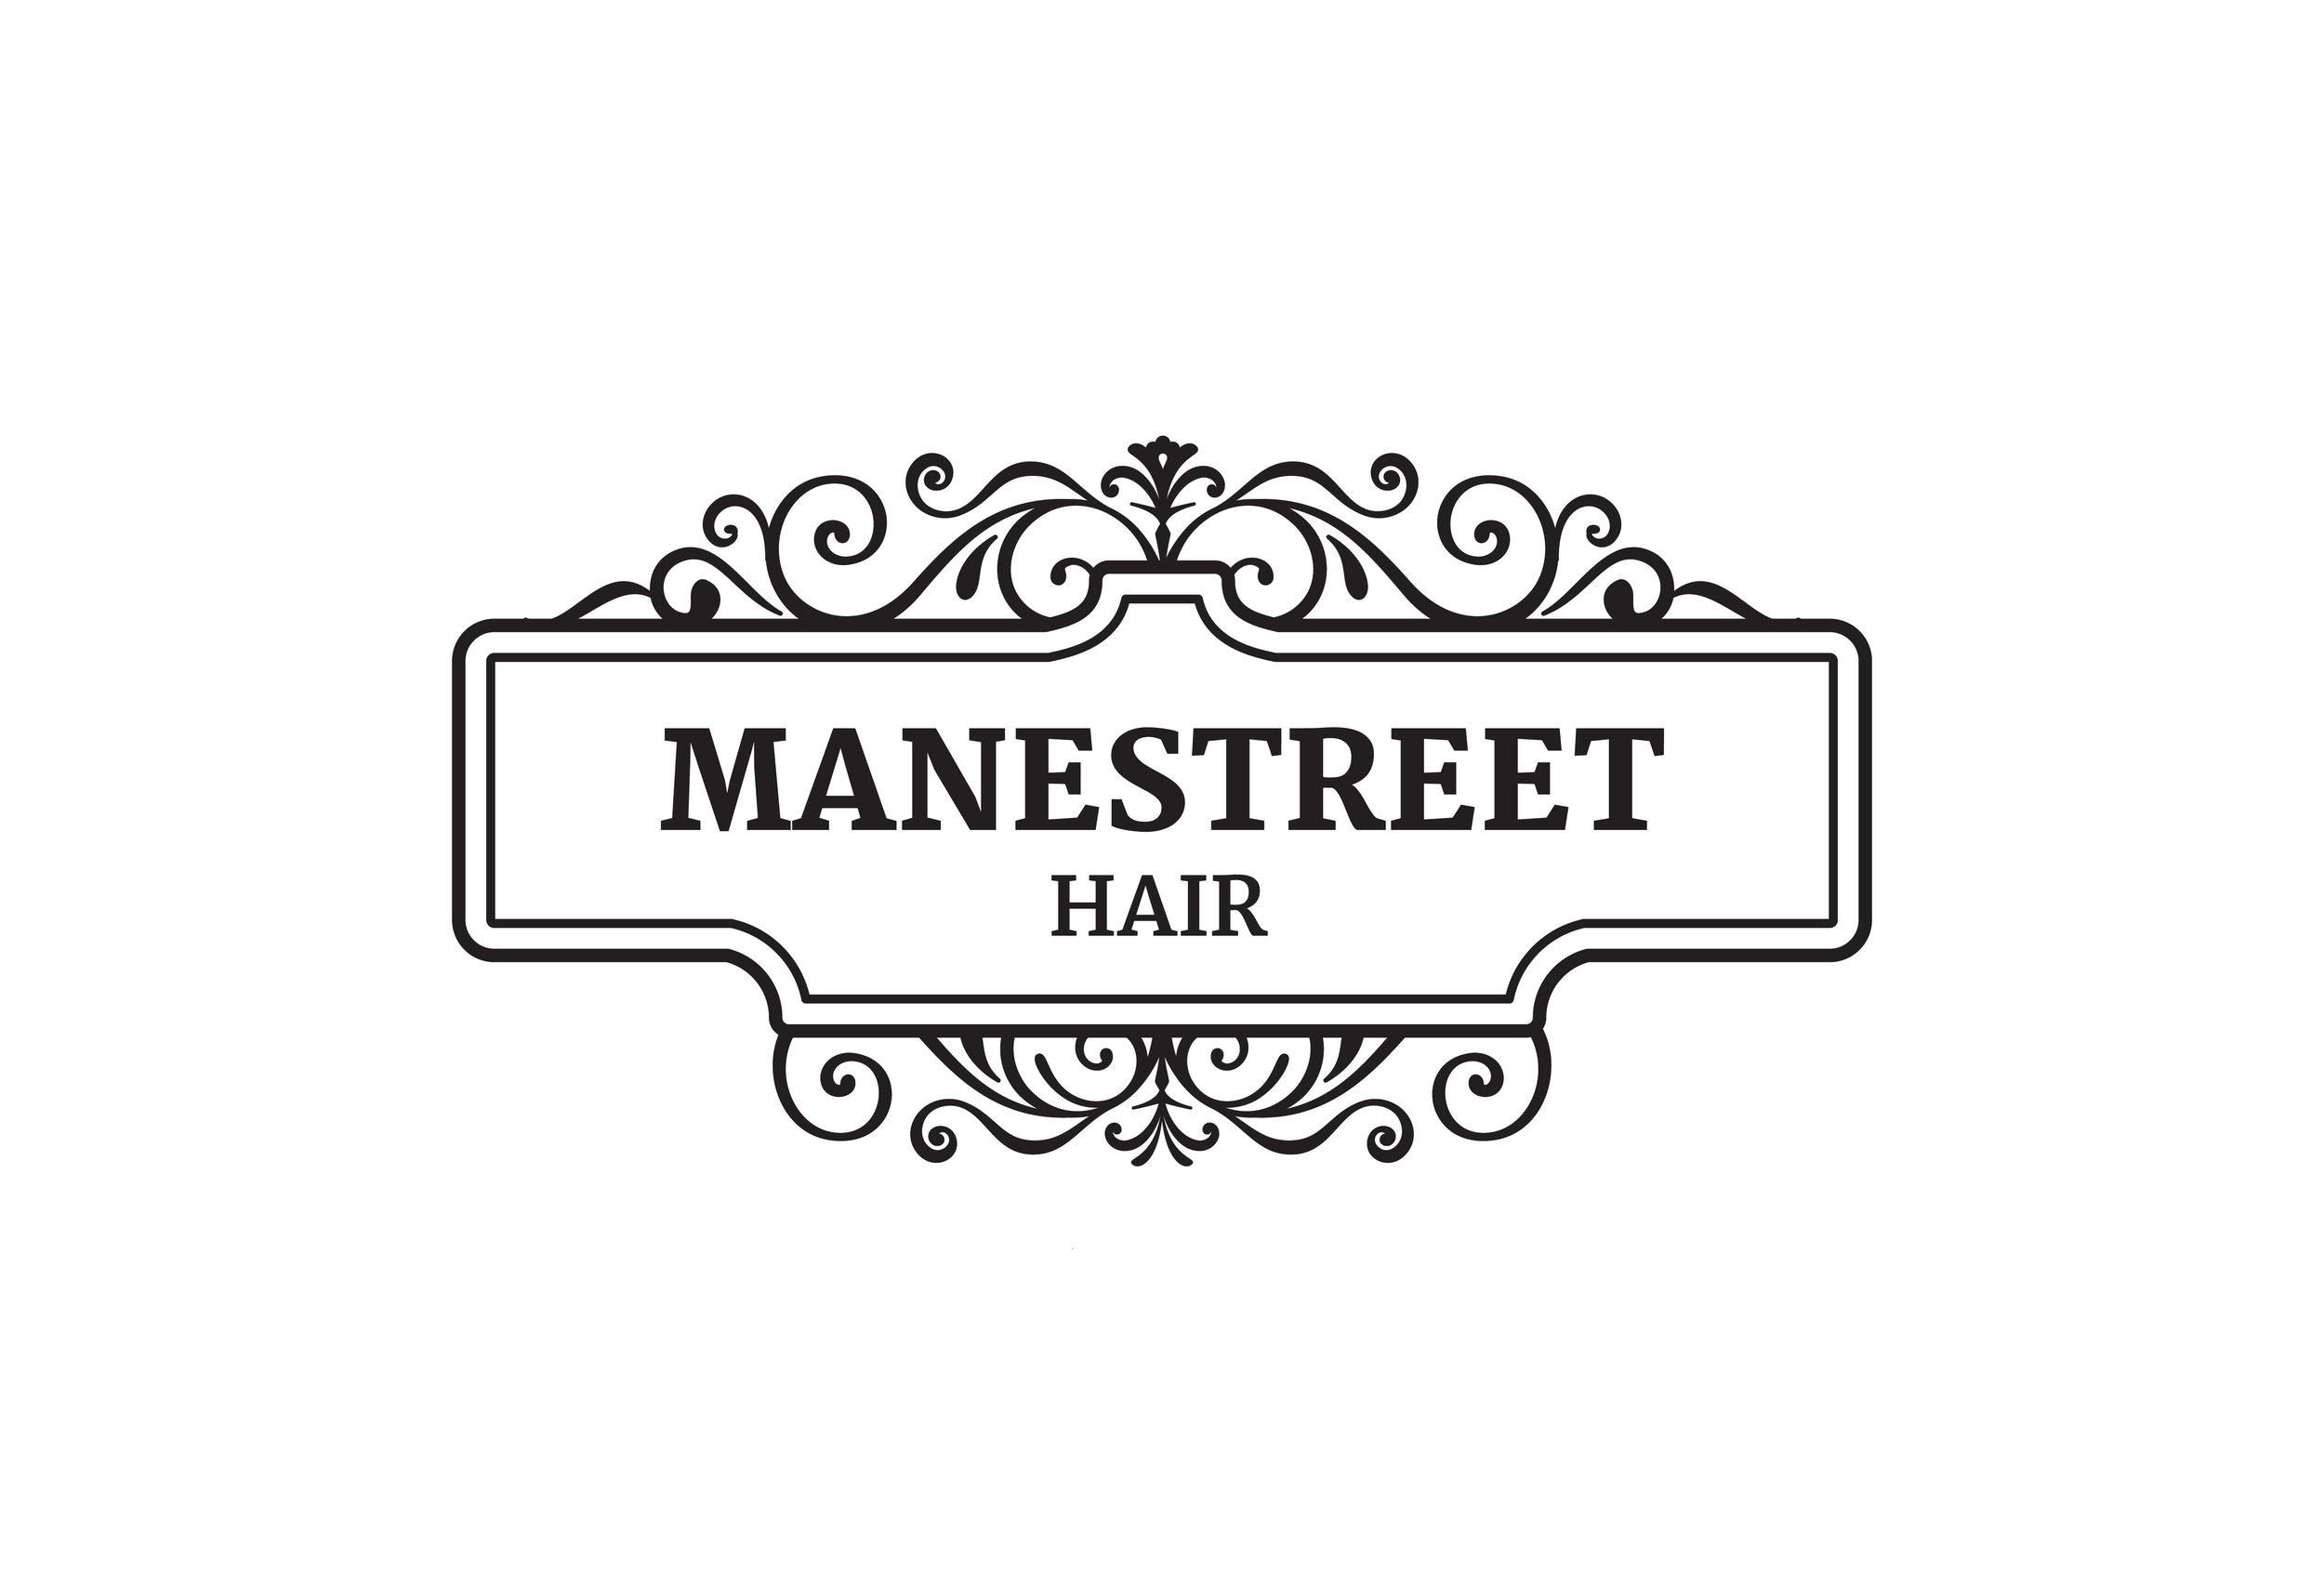 manestreet-hair